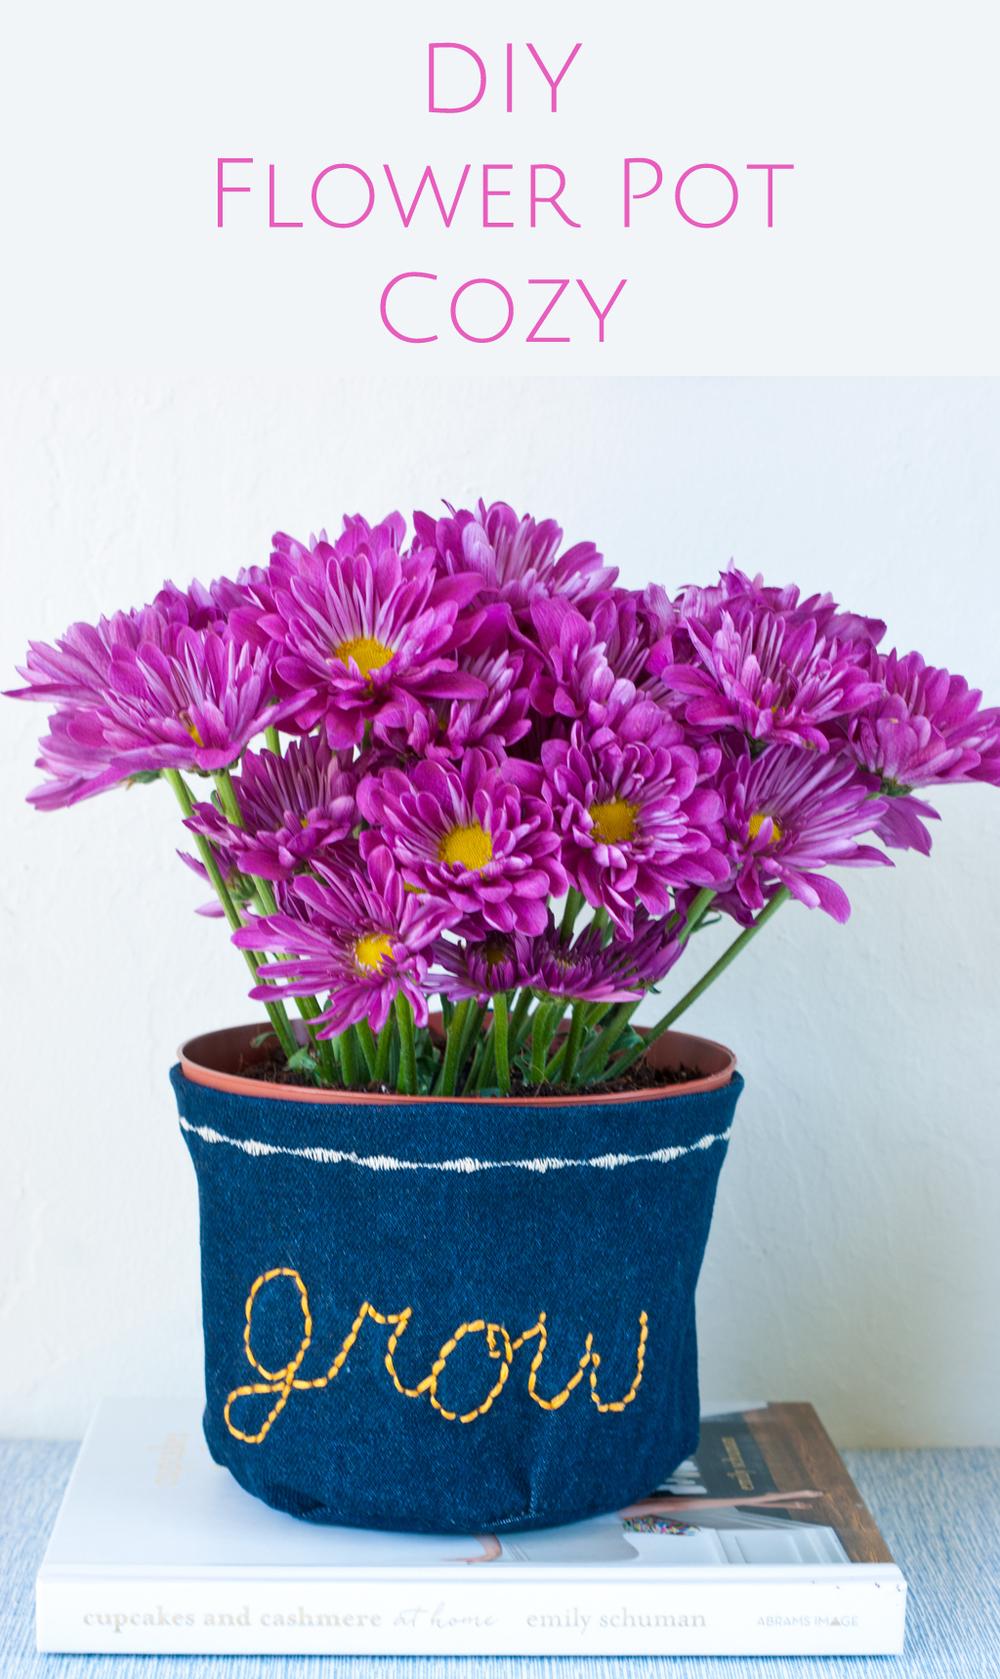 DIY Flower Pot Cozy via A Charming Project